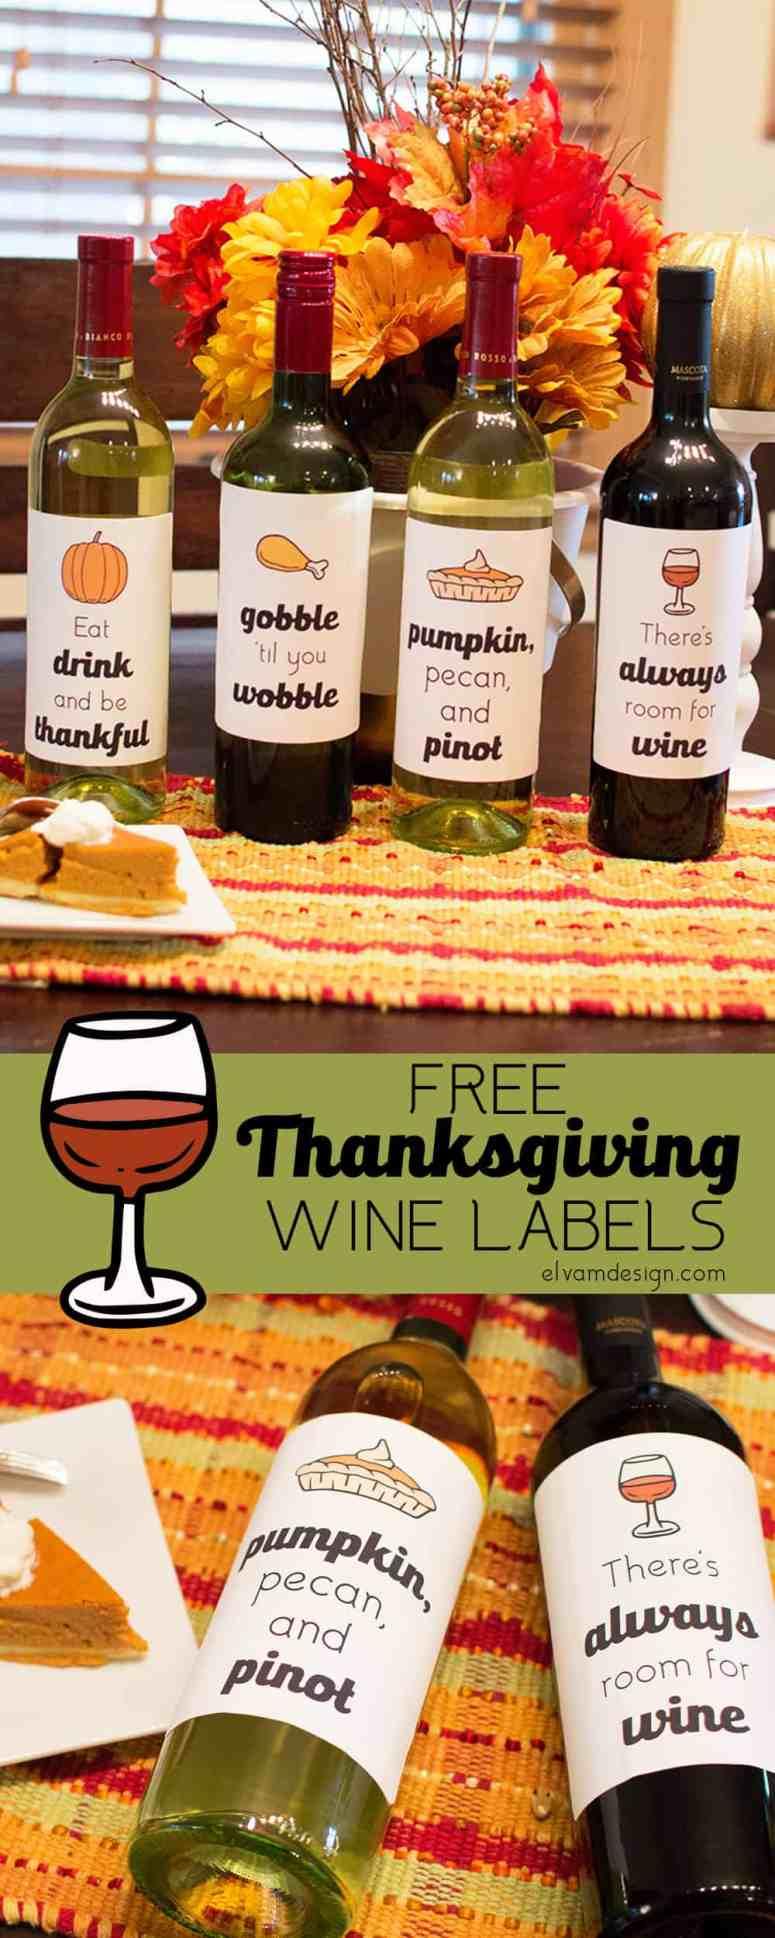 Free Thanksgiving Wine Bottle Labels from Elva M Design Studio